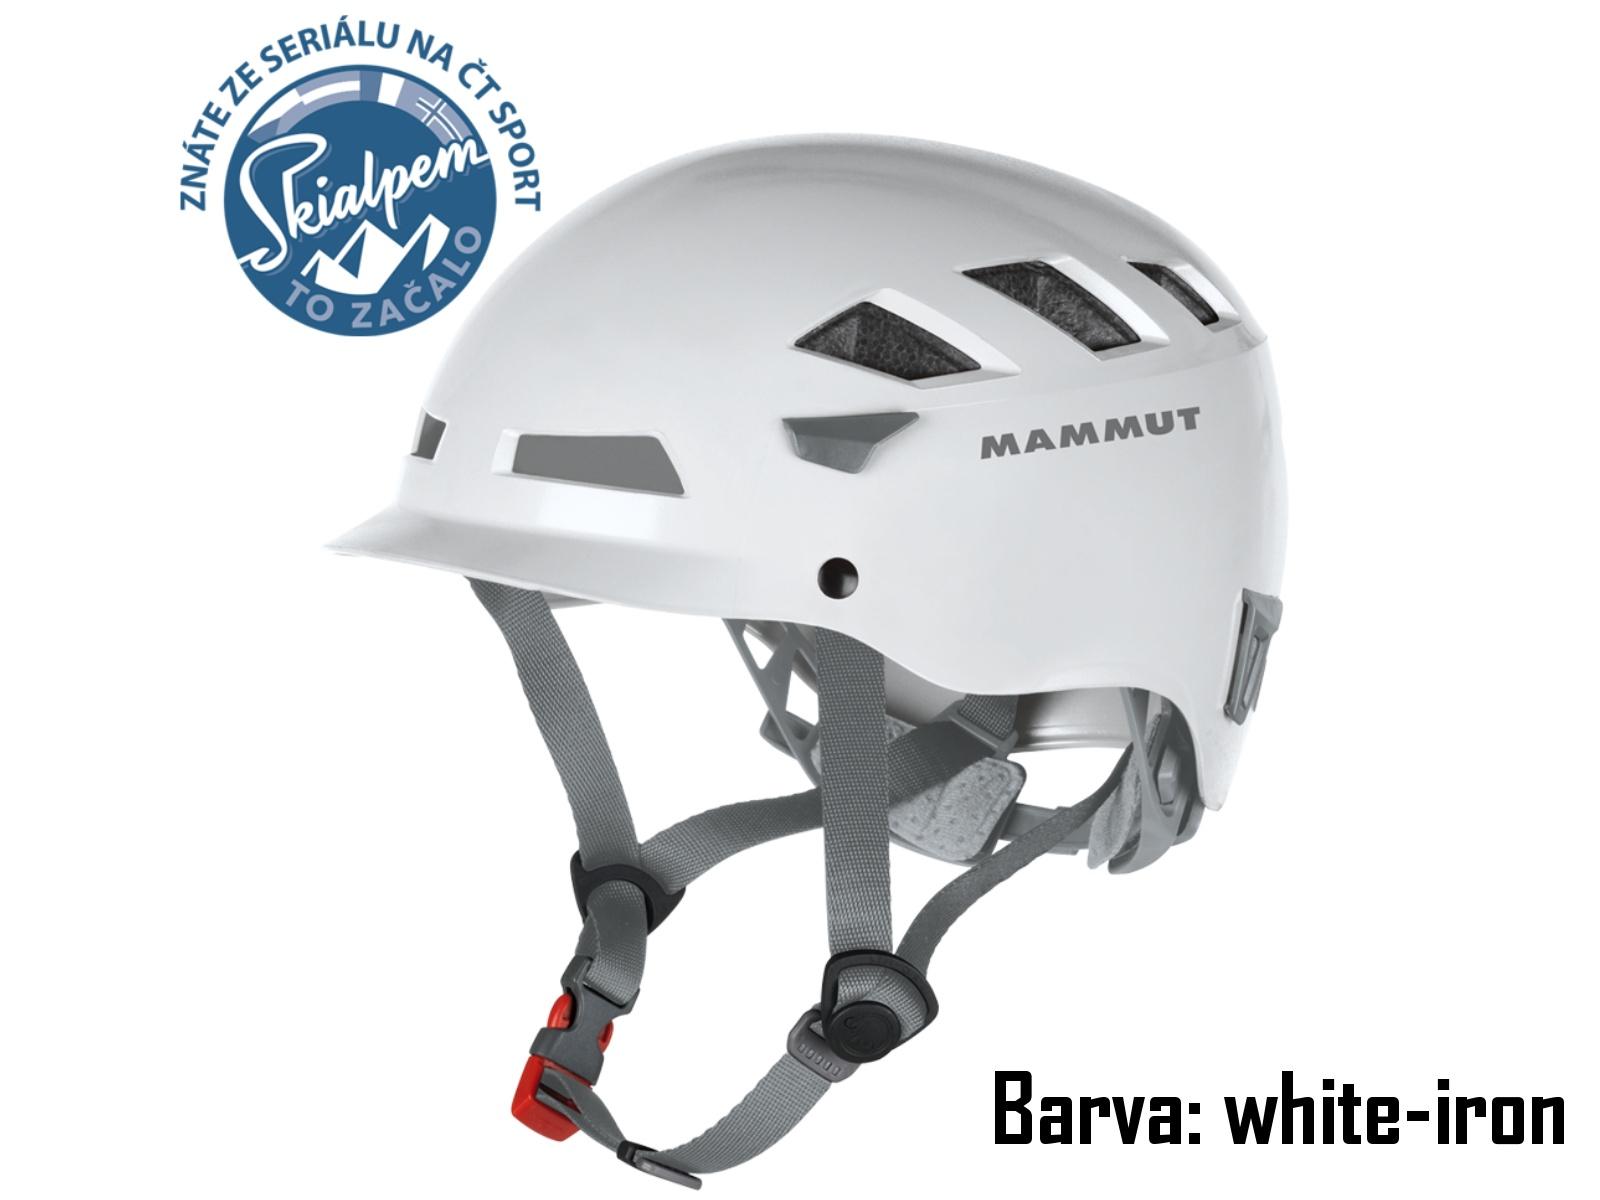 Horolezecká přilba MAMMUT El Cap white-iron, vel. 56-61 cm